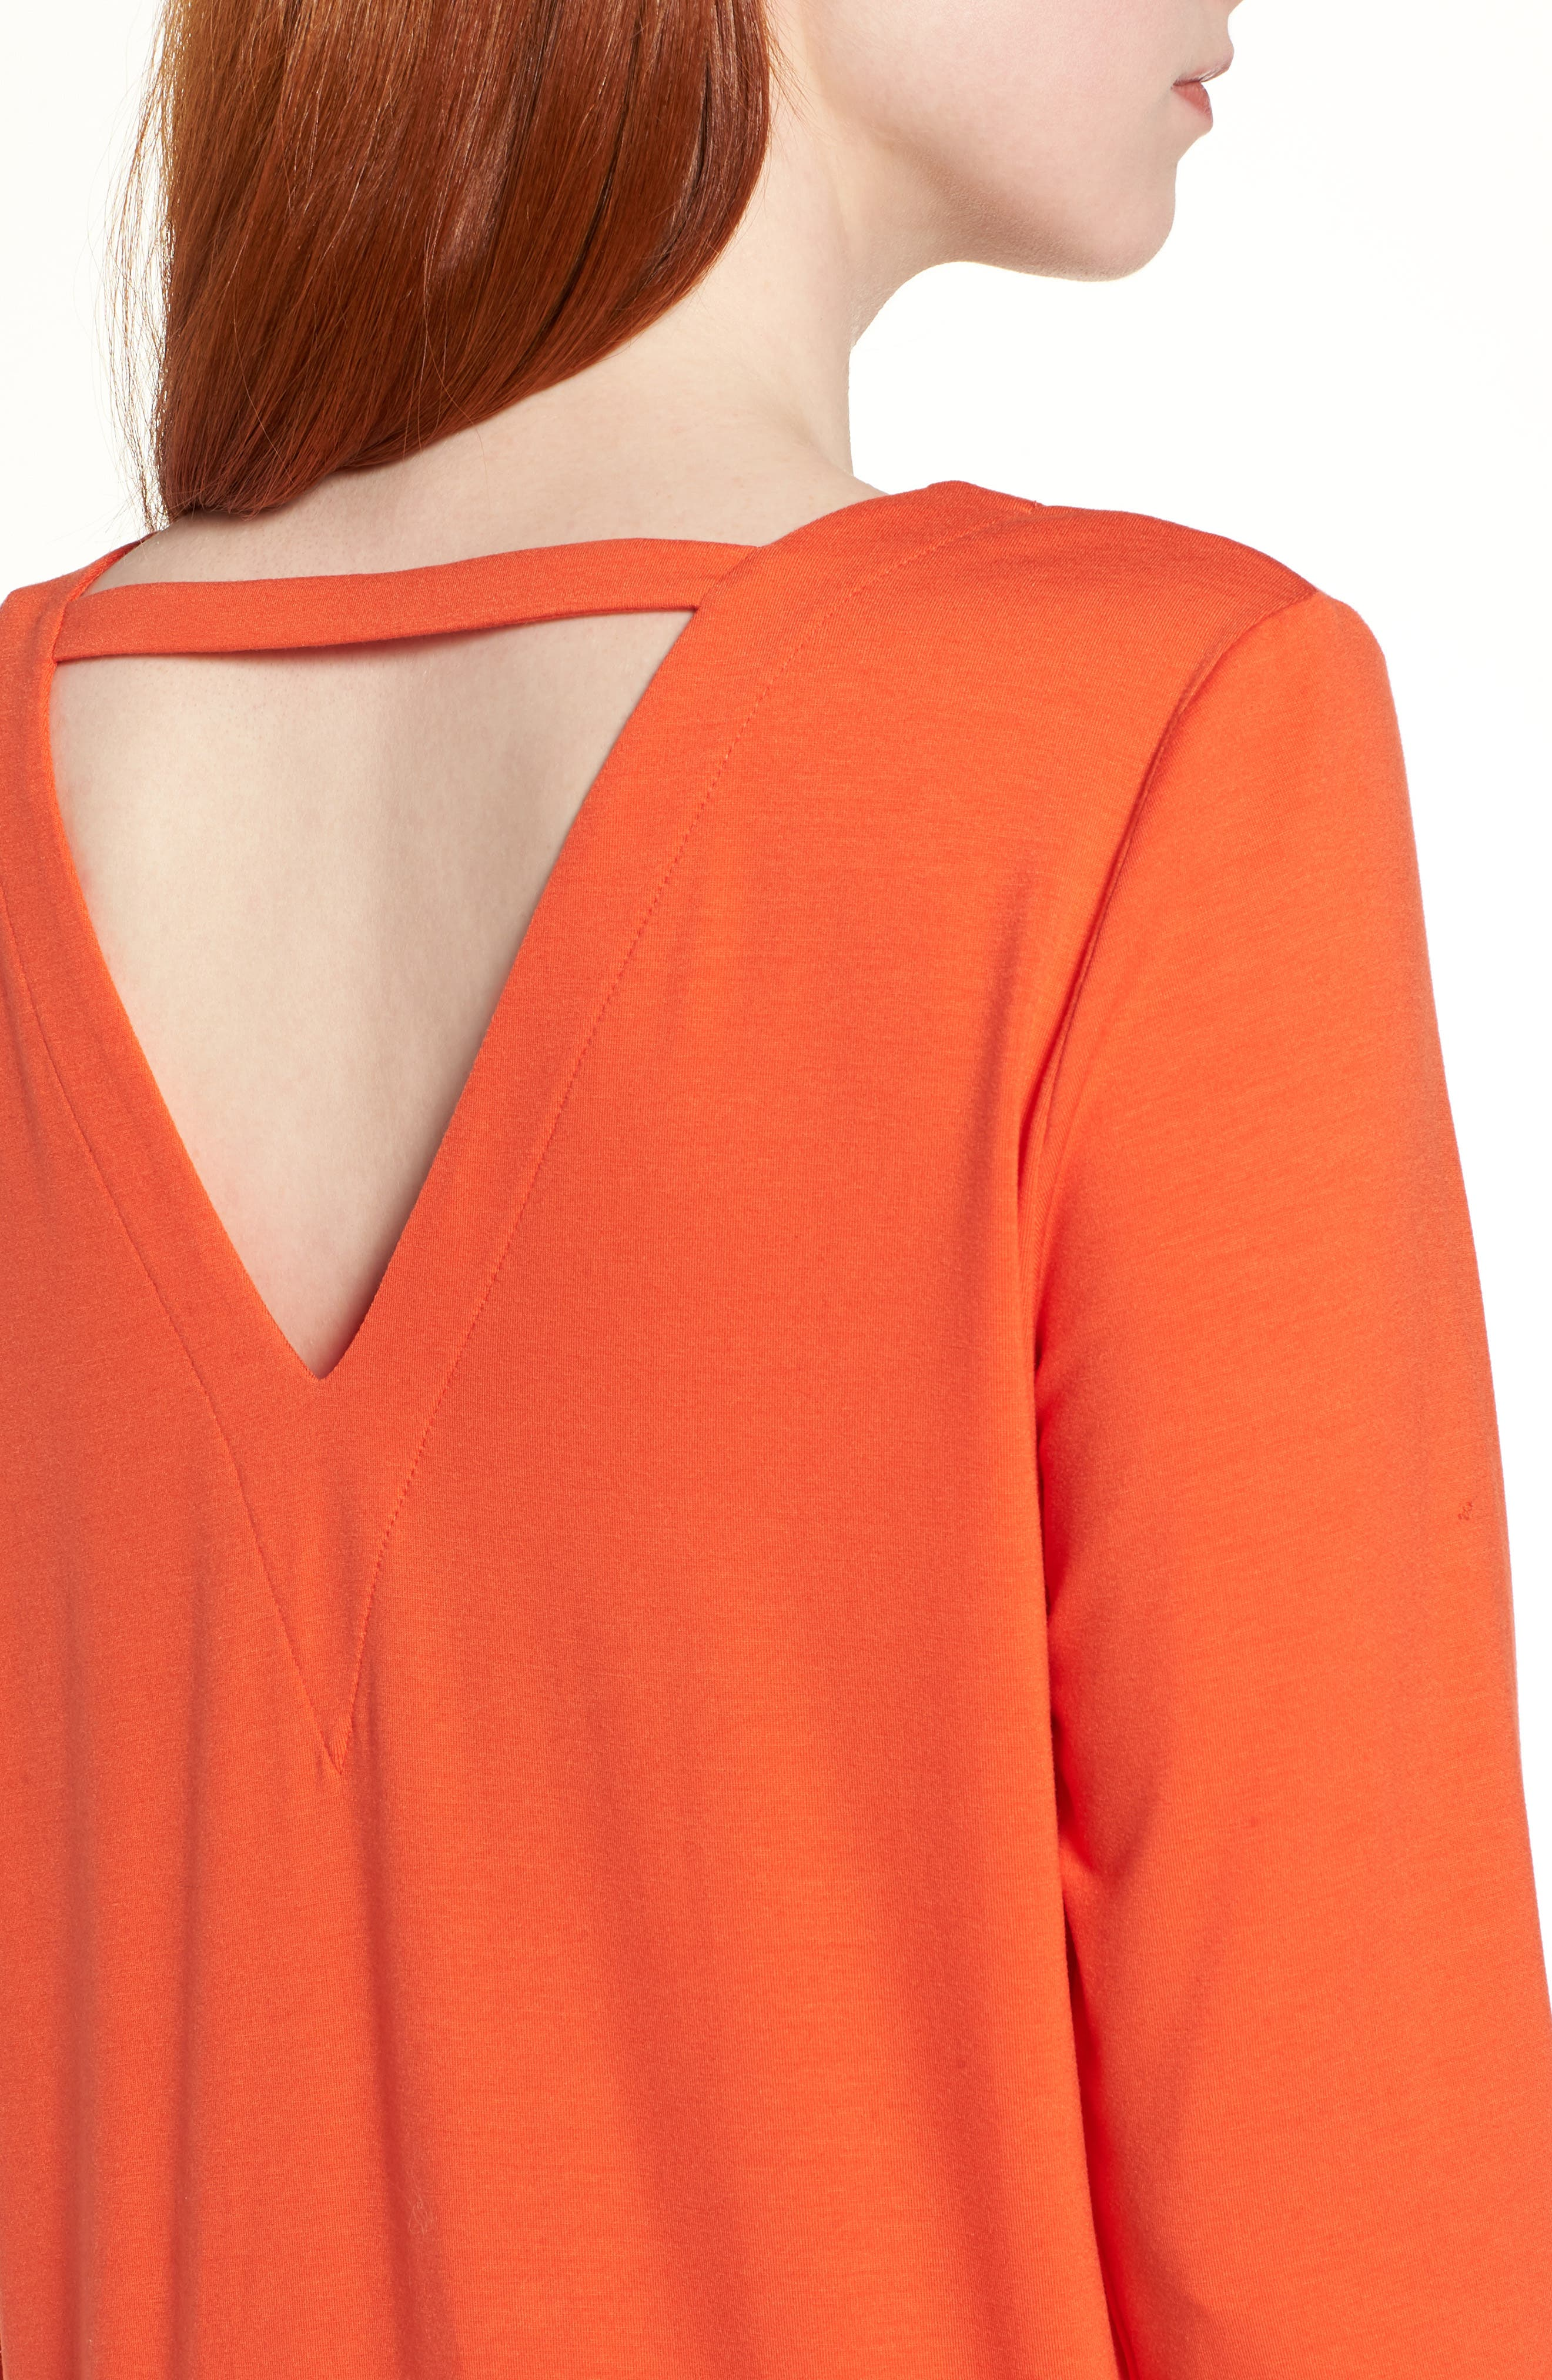 V-Back Stretch Tencel<sup>®</sup> Lyocell Shift Dress,                             Alternate thumbnail 9, color,